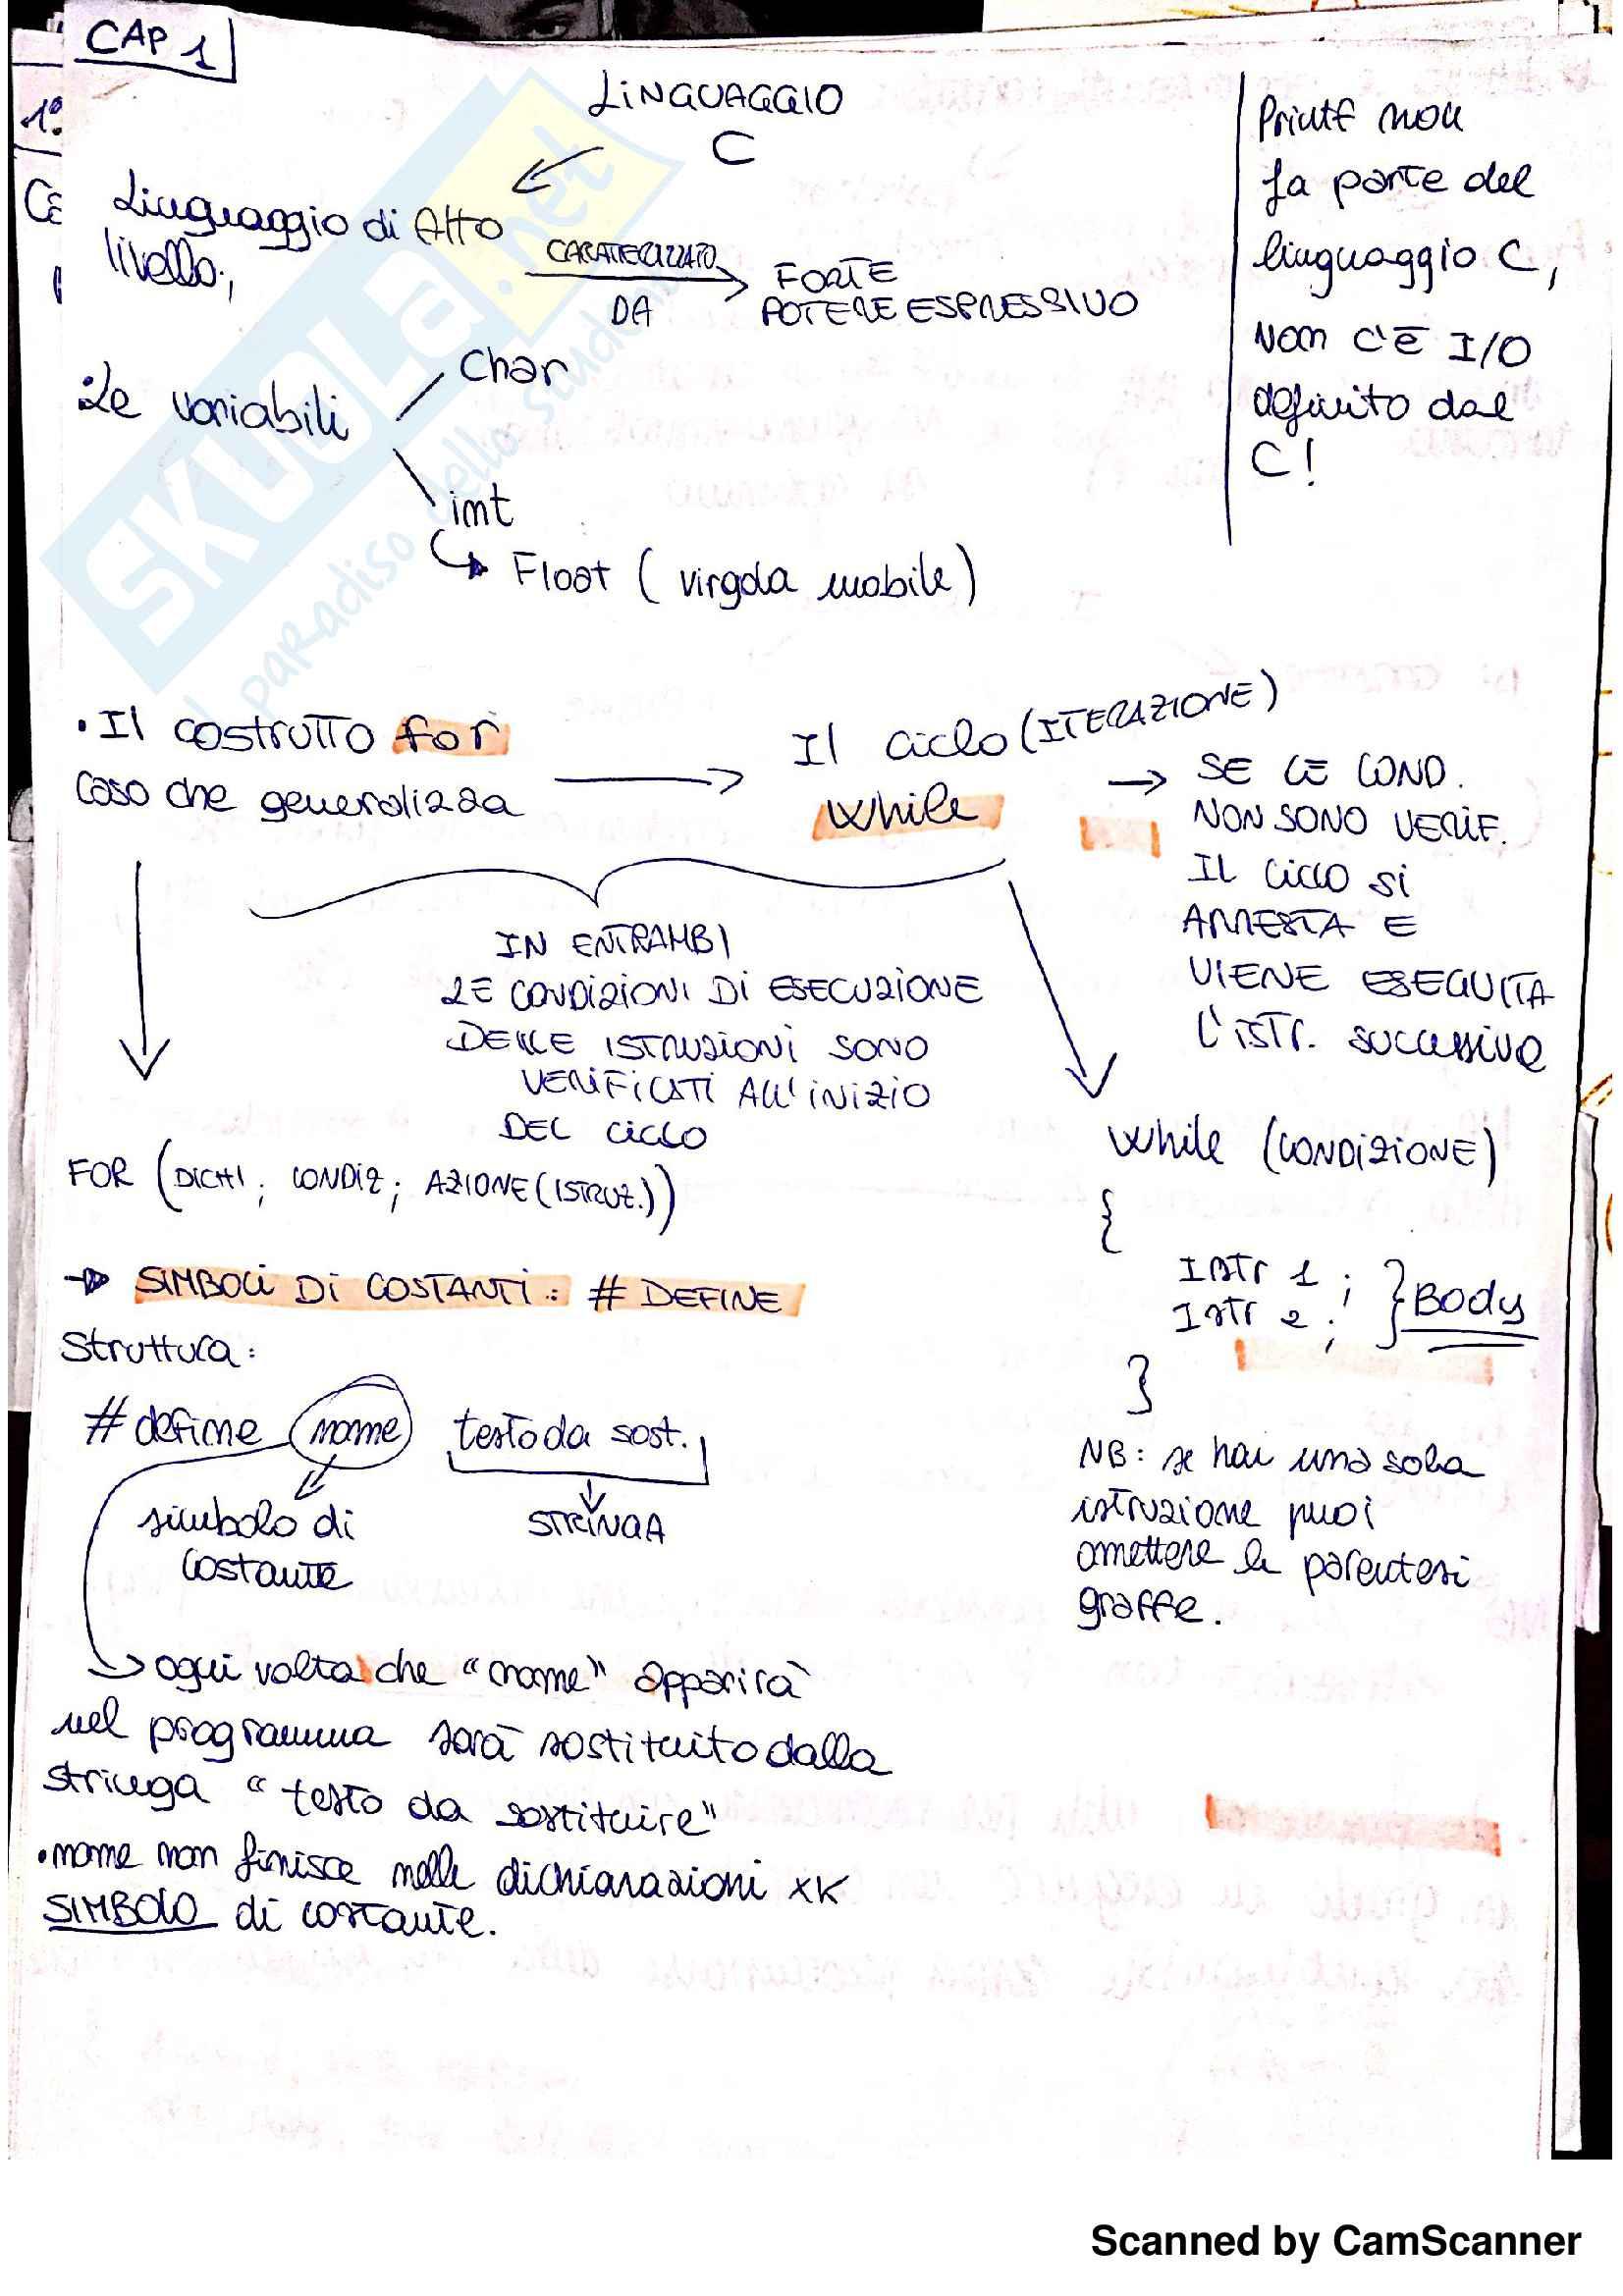 Linguaggio C: Teoria ed esempi